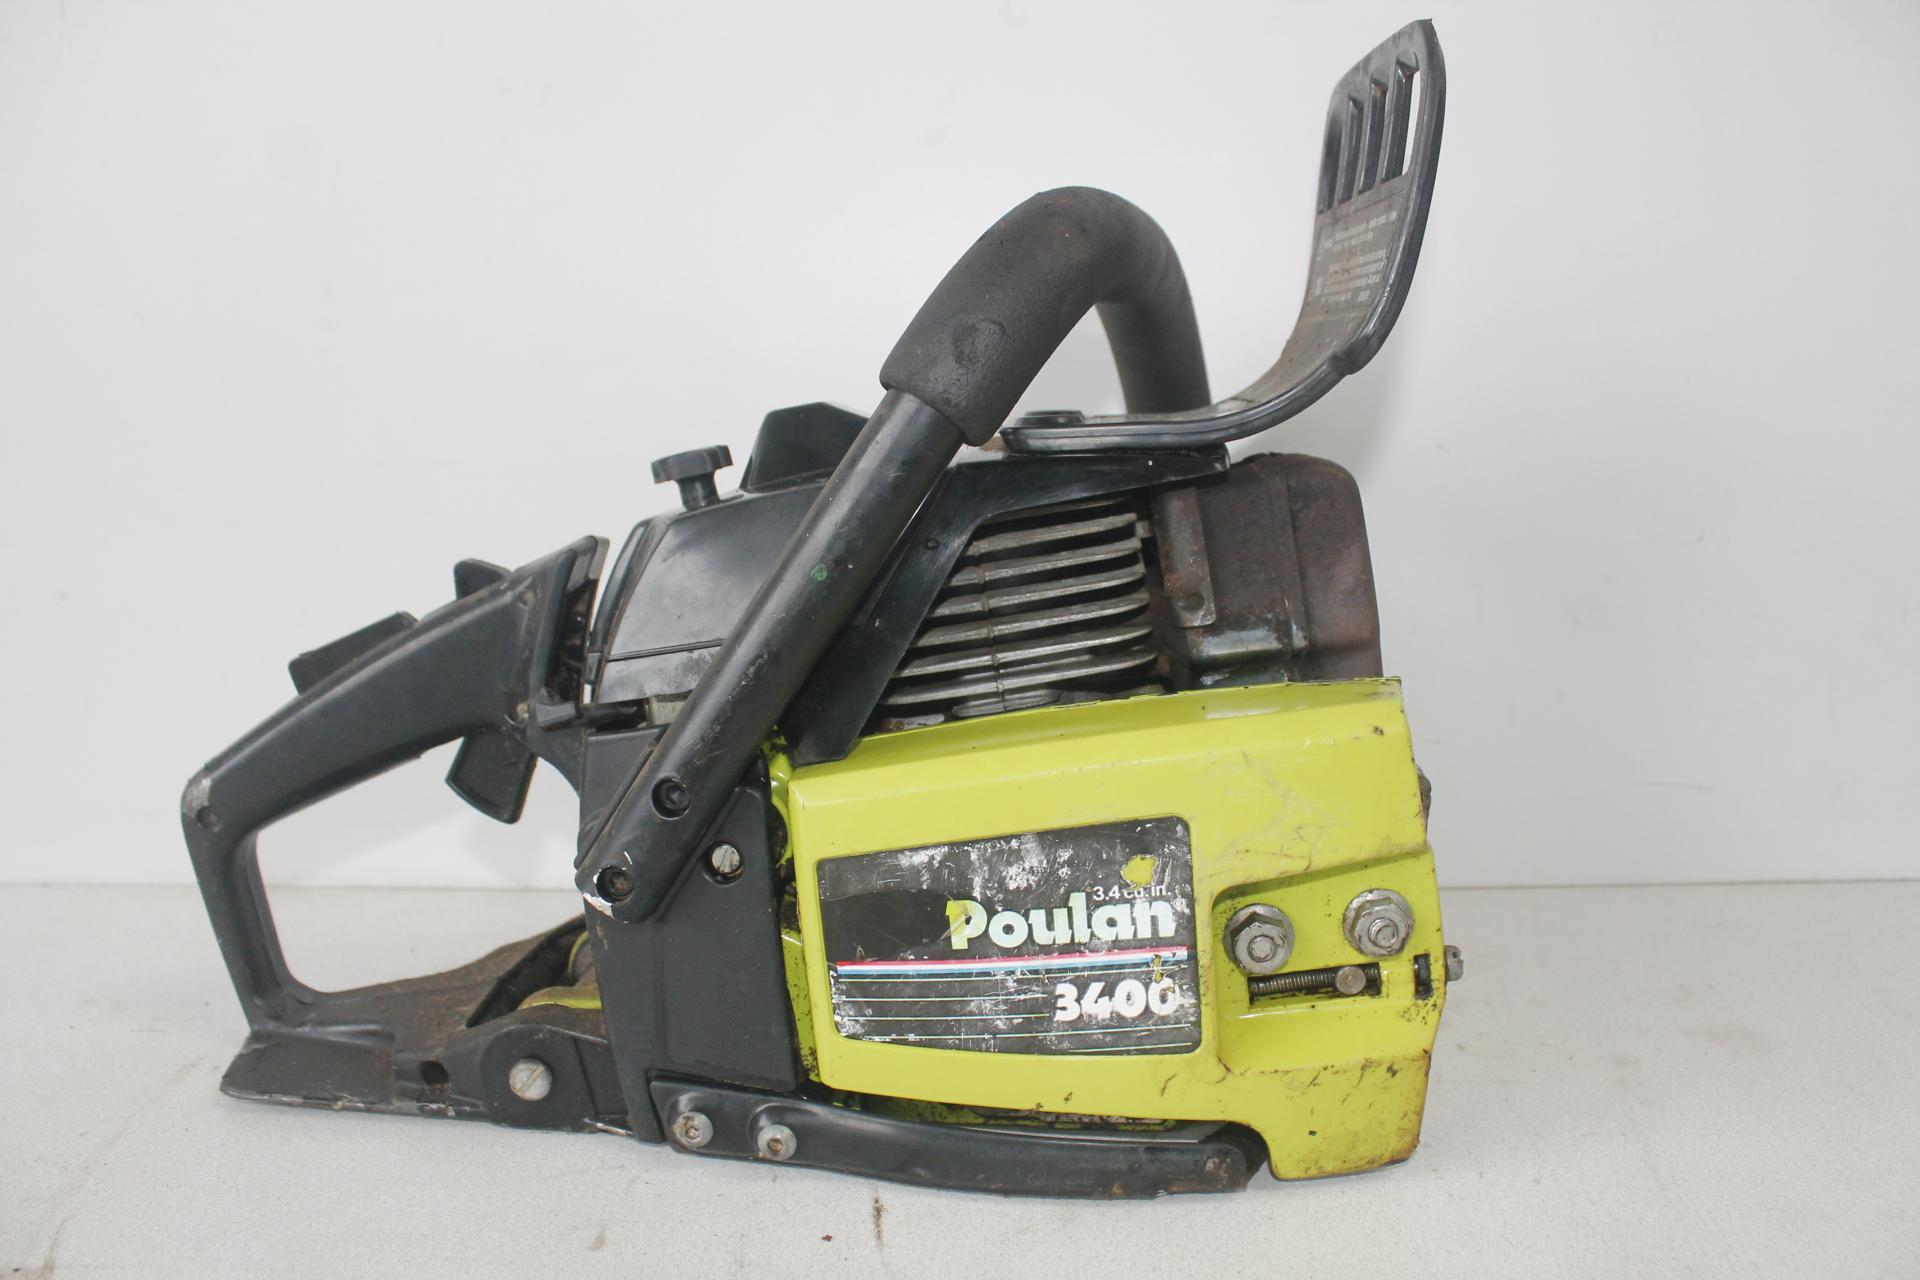 Despiece Poulan 3400